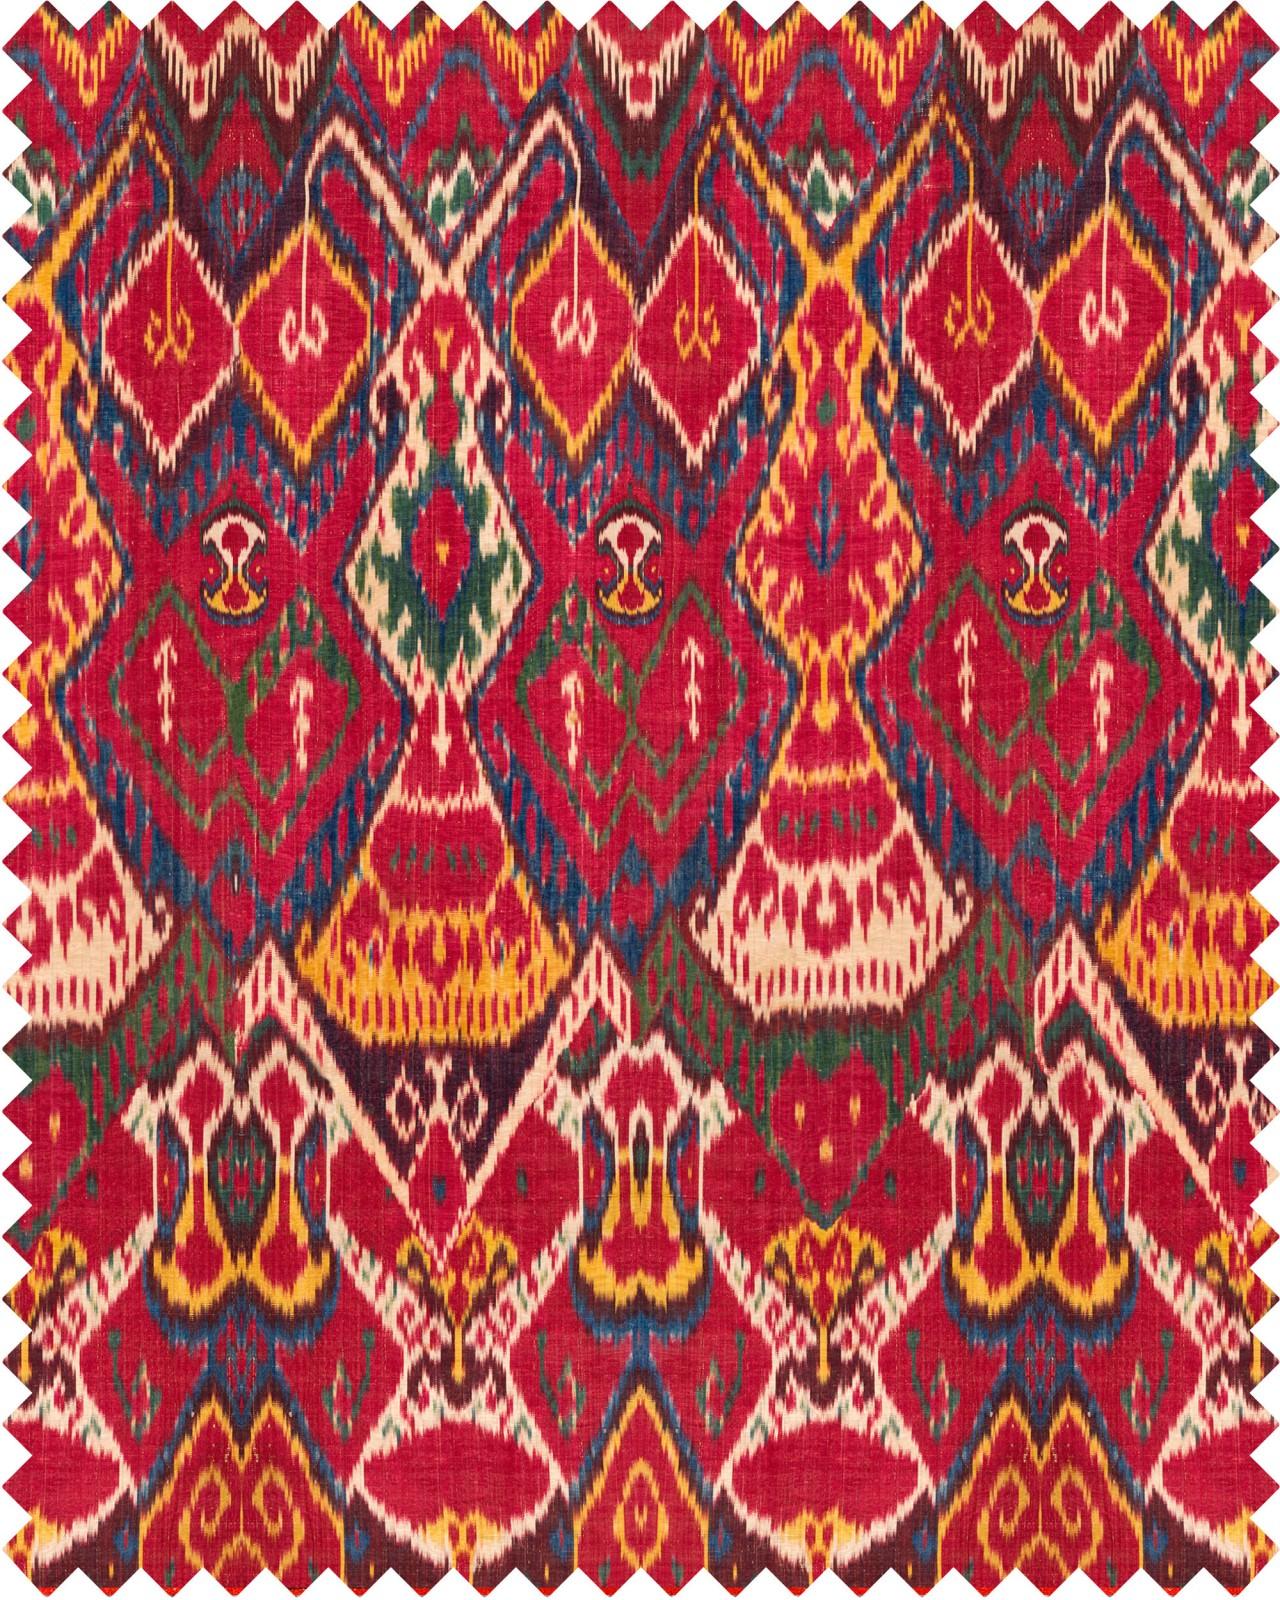 UZBEK IKAT Linen Fabric Sample